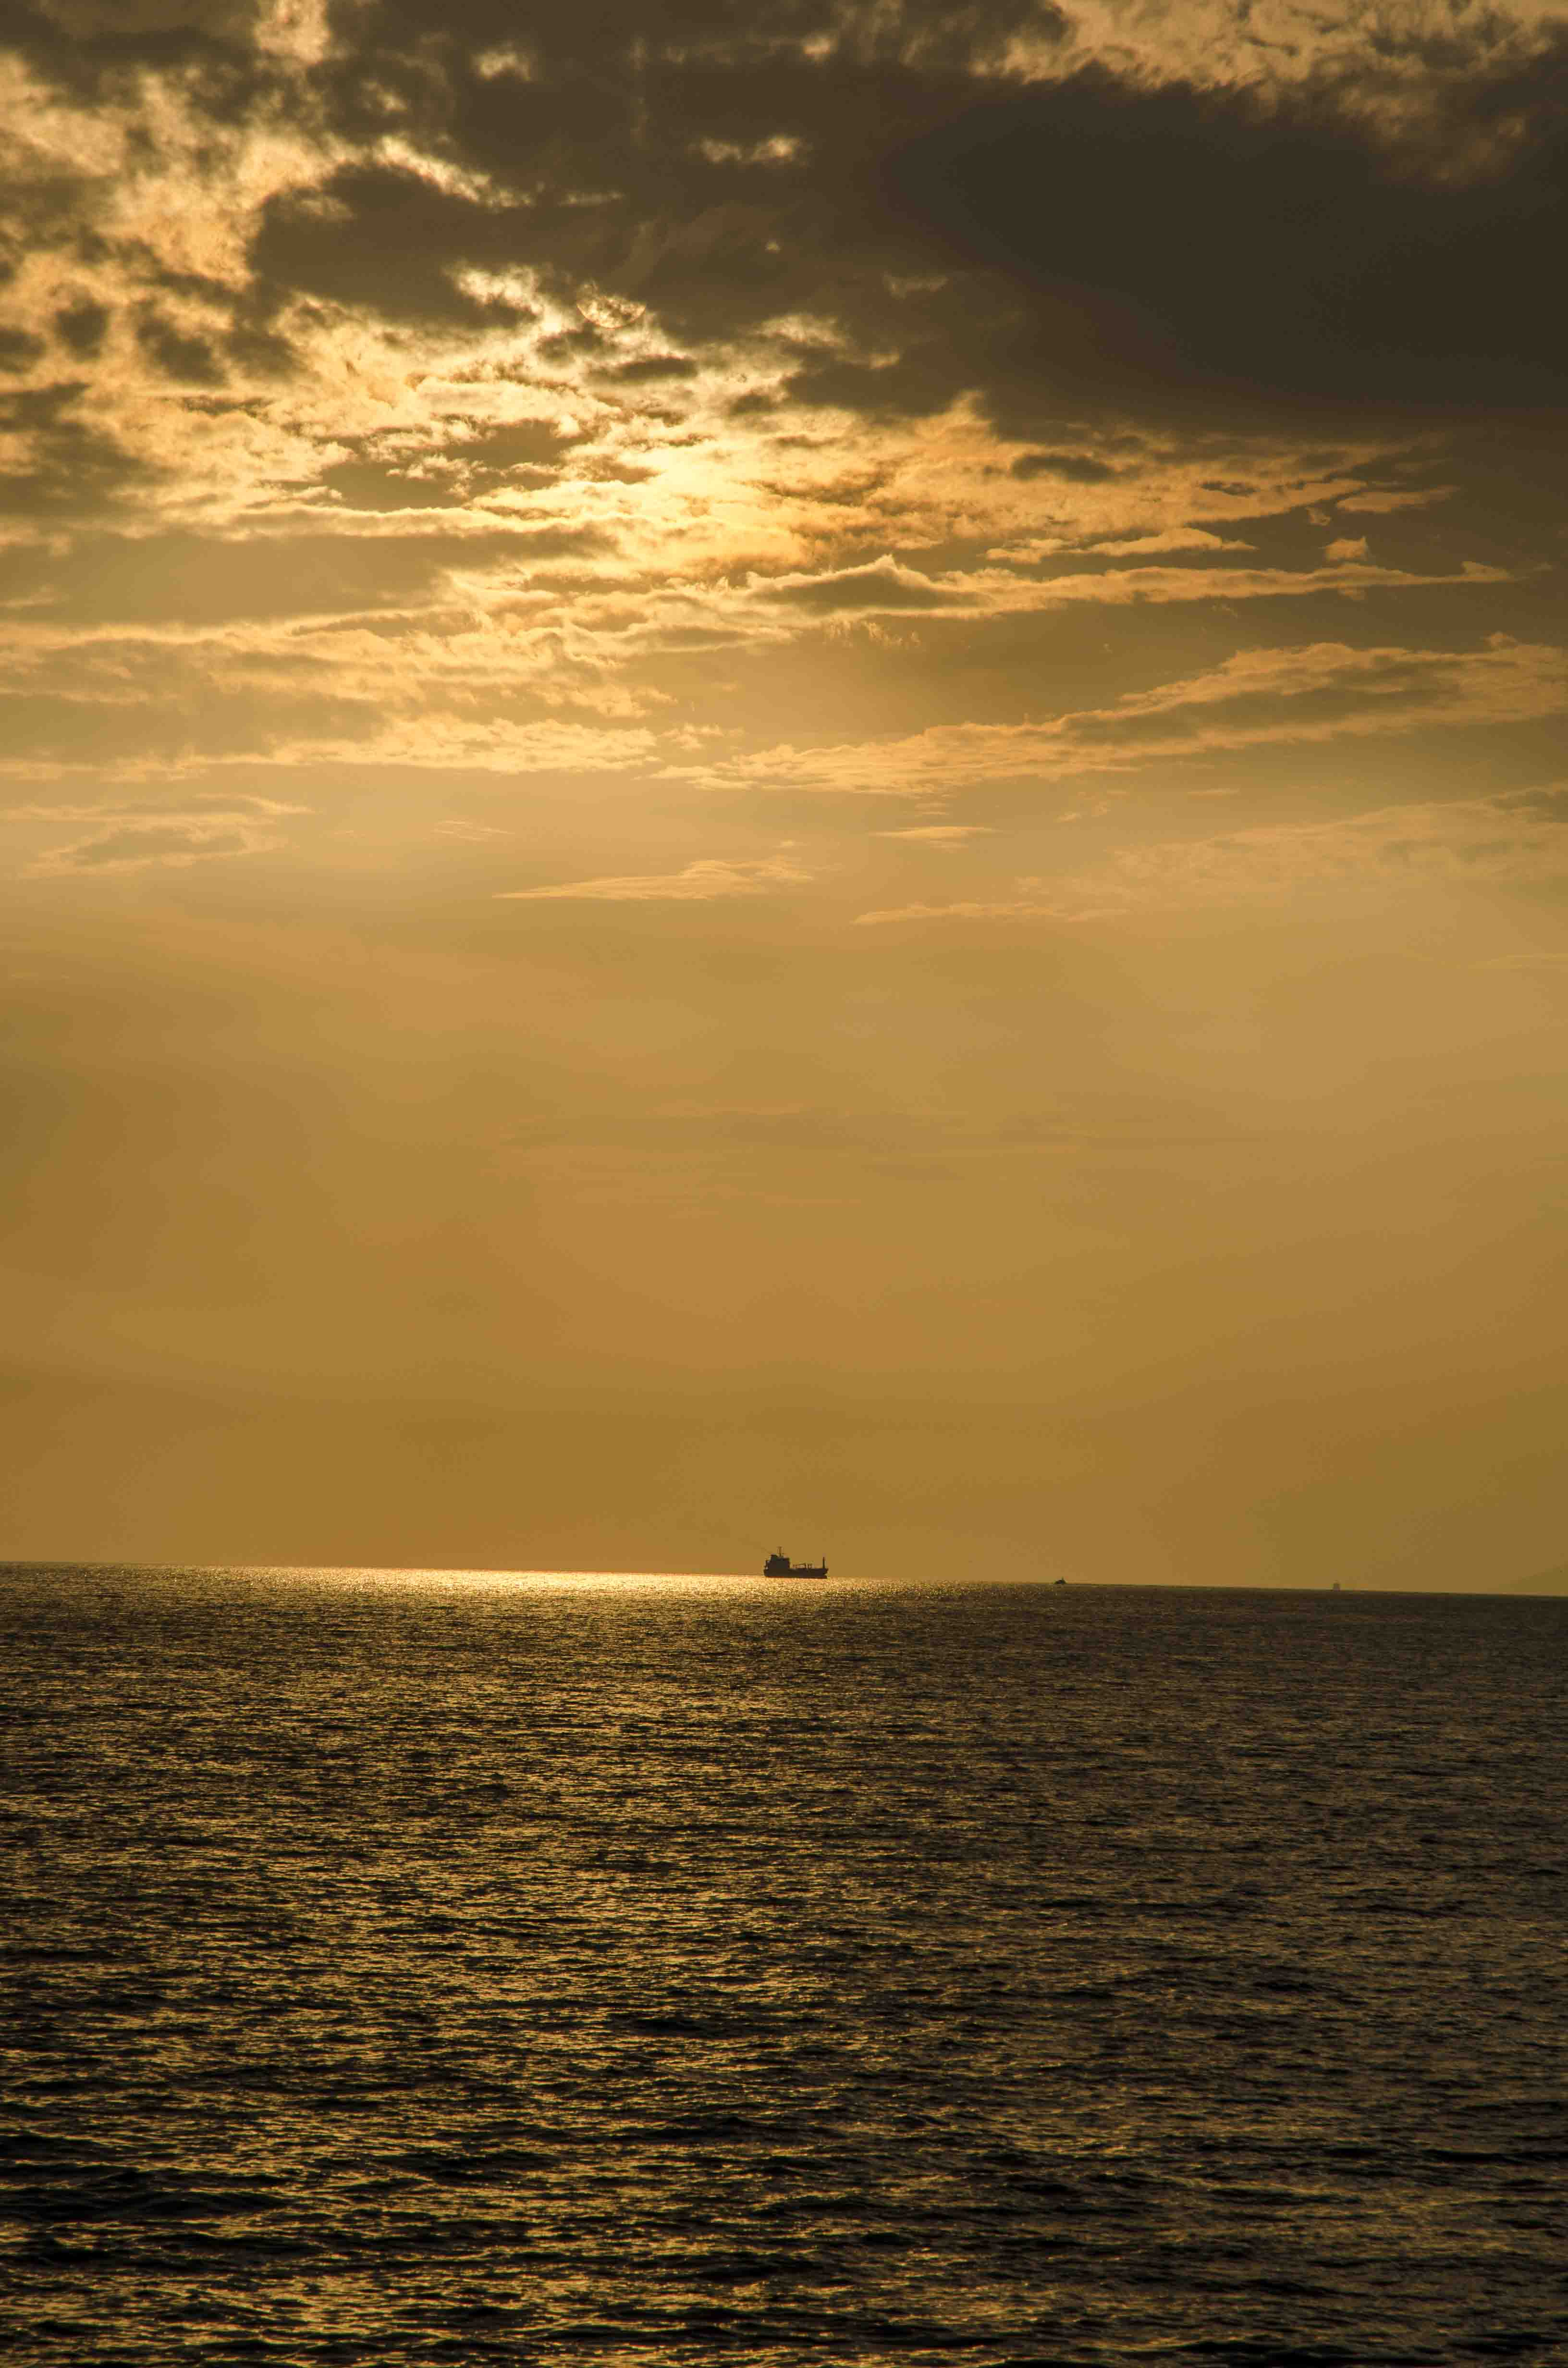 Arrival from Bursa - Marmara sea